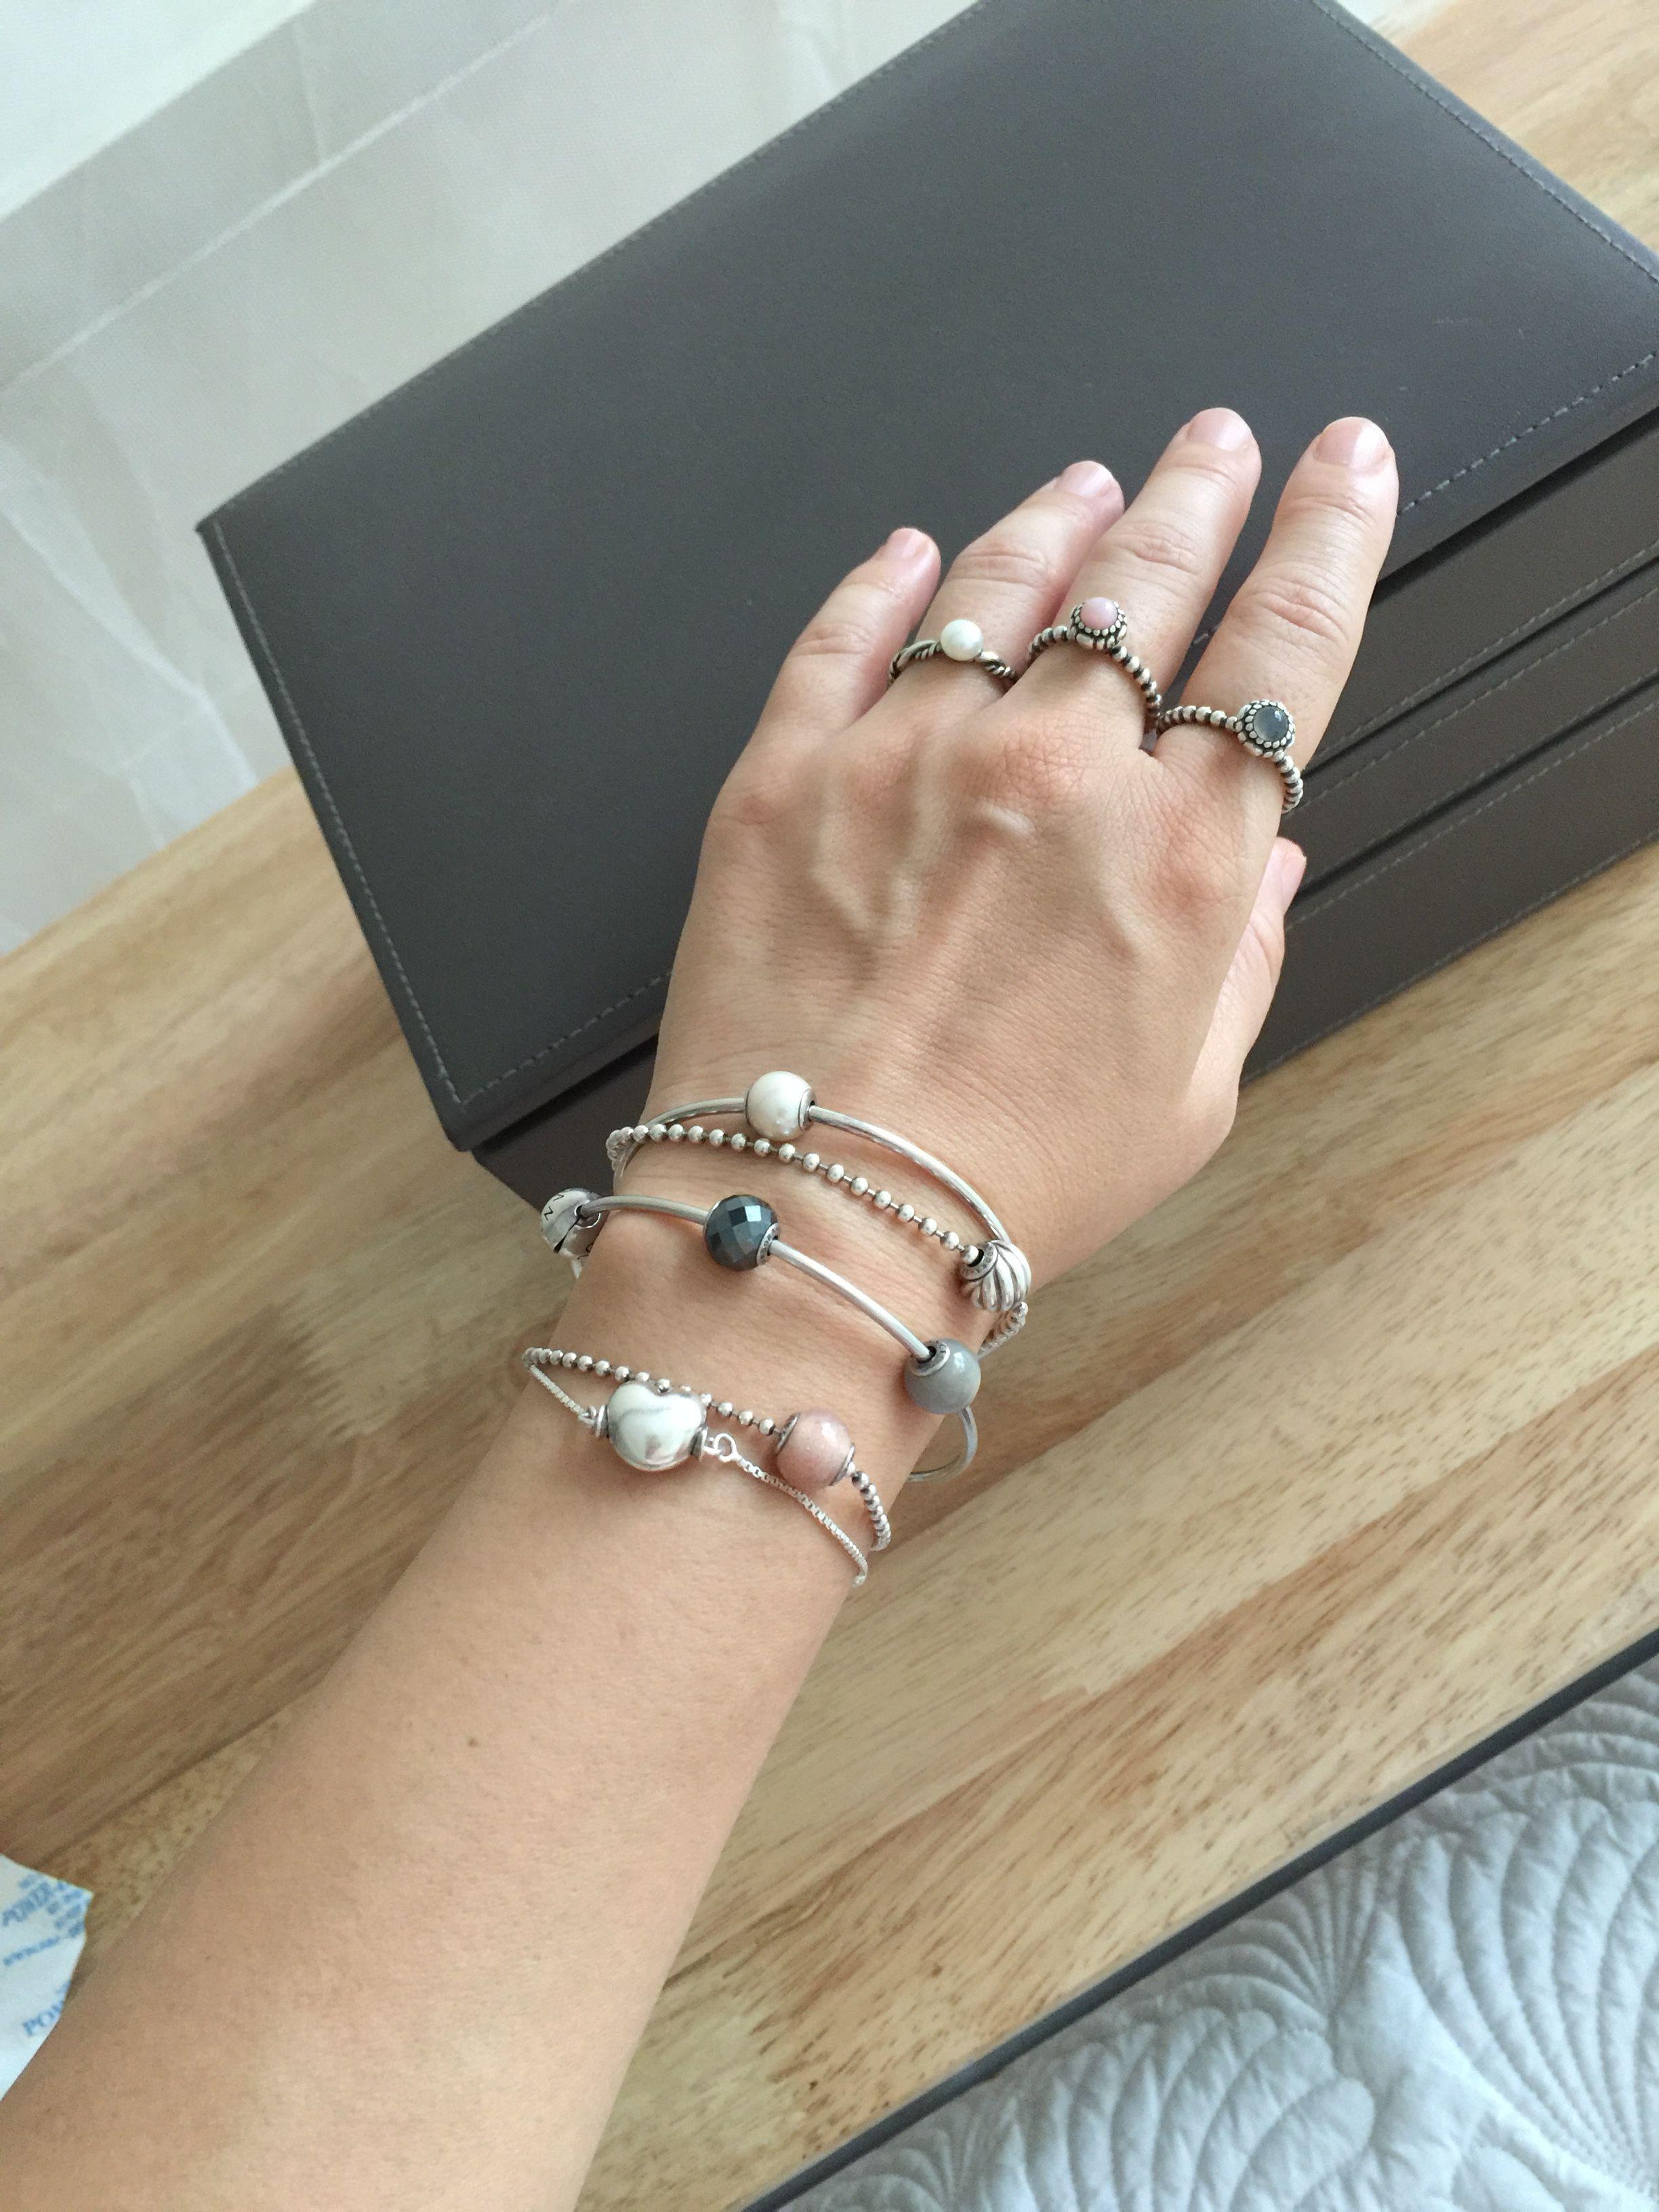 522d47b13 Pandora ESSENCE Silver Bangle 596006 | jewellery | Pandora essence,  Jewelry, Pandora